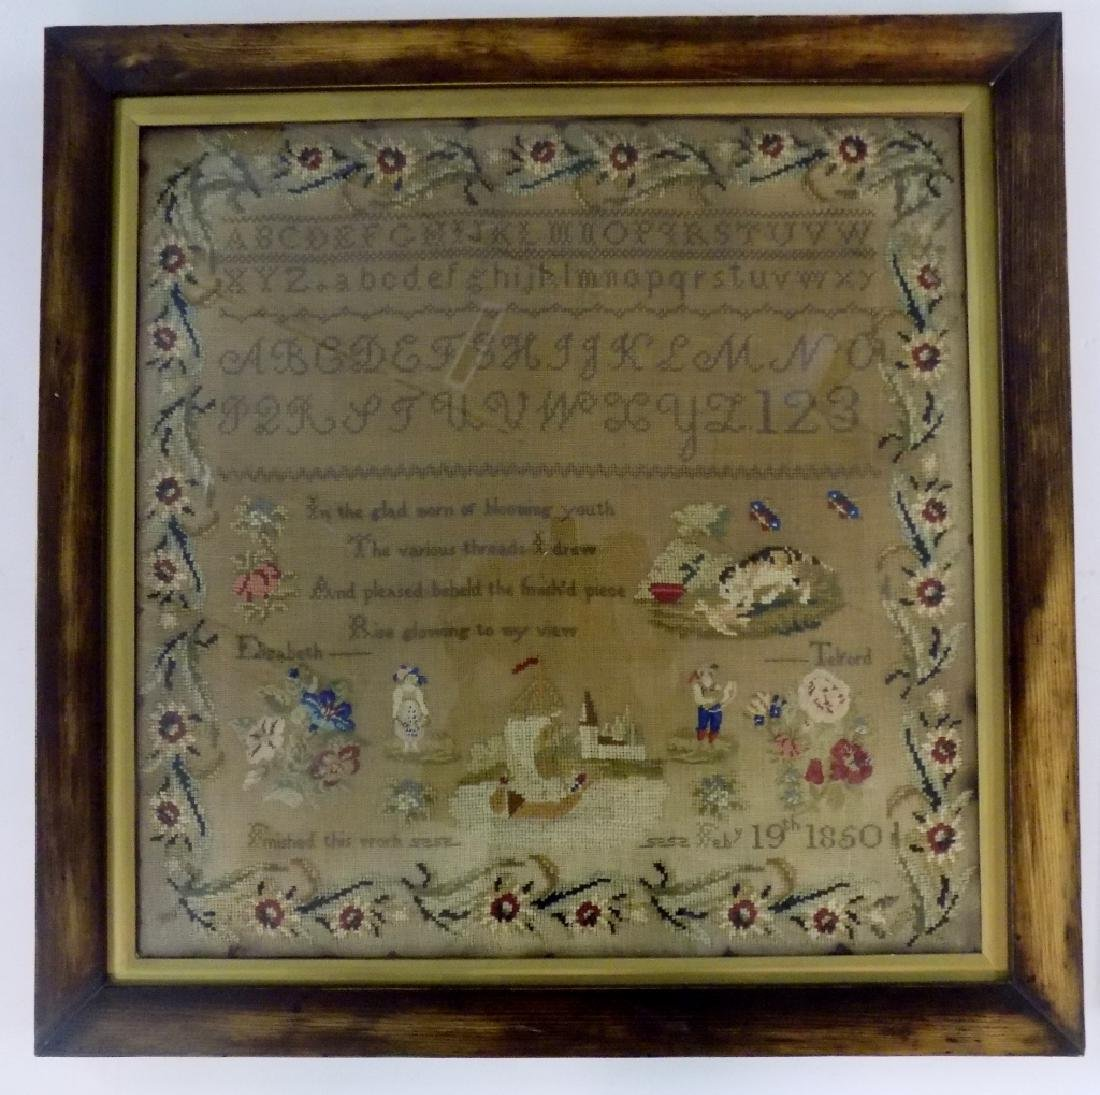 1850 ALPHABET SAMPLER